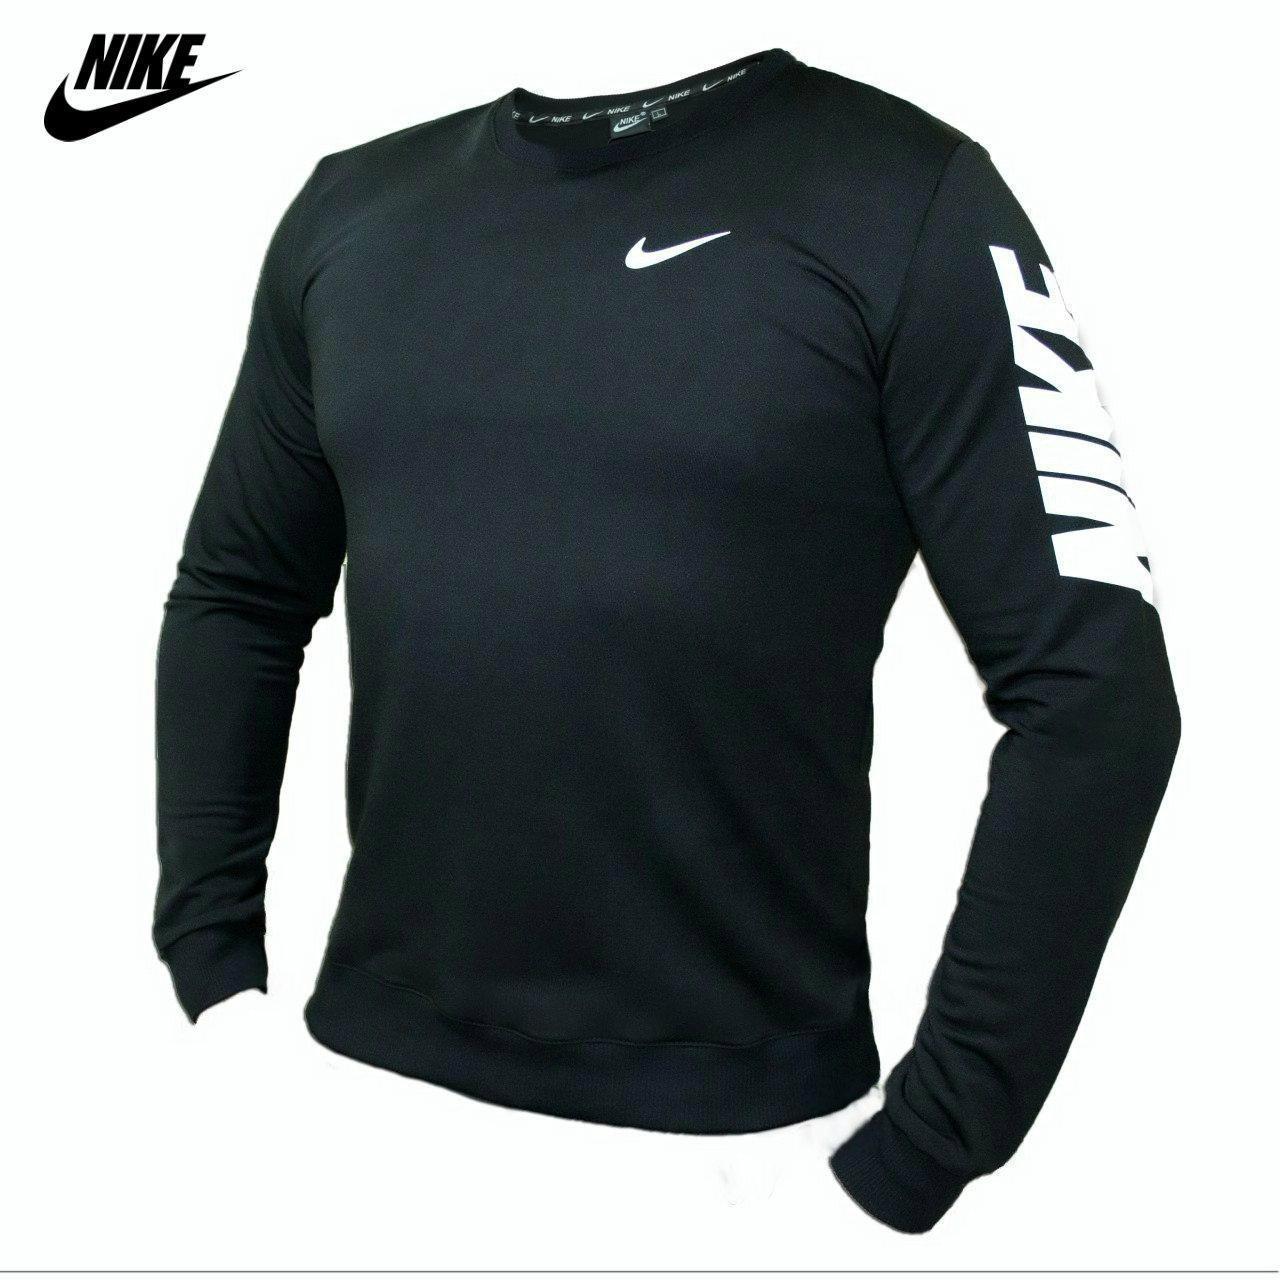 Мужской Cвитшот. Реплика Nike. Мужская одежда